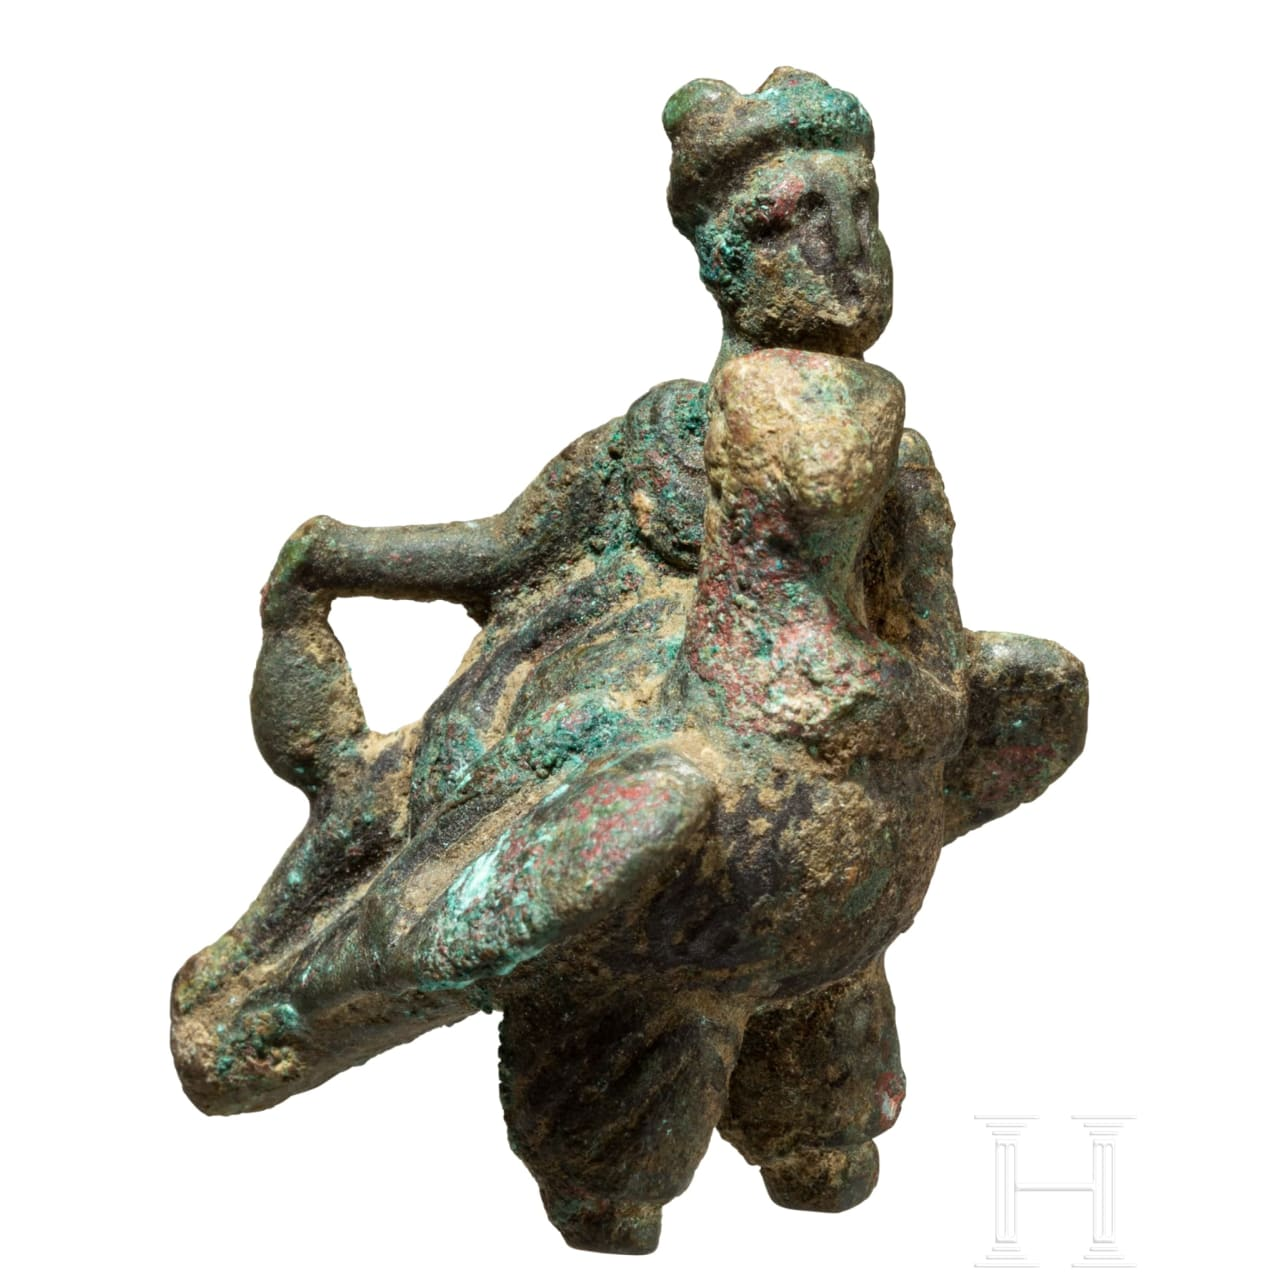 "Miniaturbronze ""Merkur auf Adler gelagert"", römisch, 2. - 3. Jhdt."